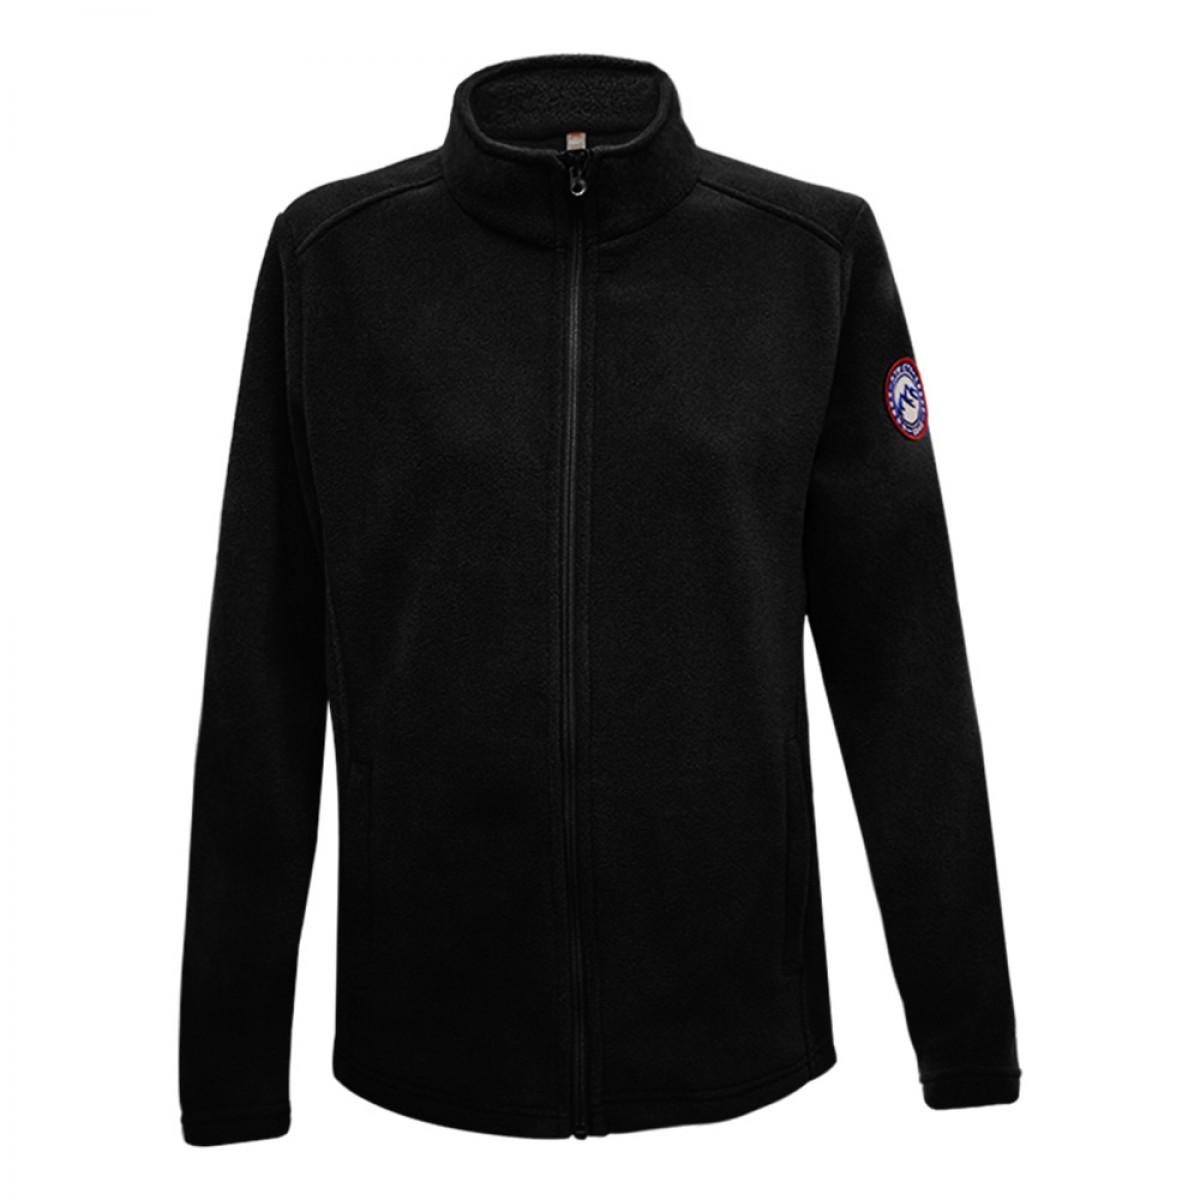 8848-women-thick-fleece-jacketkfj06850-8a